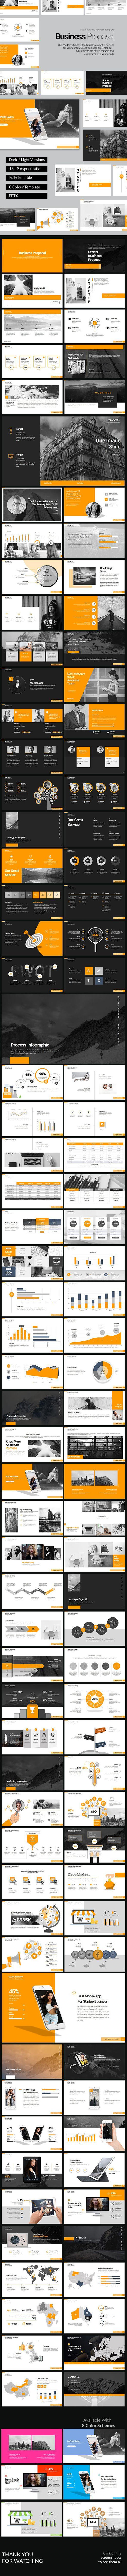 business proposal keynote templates